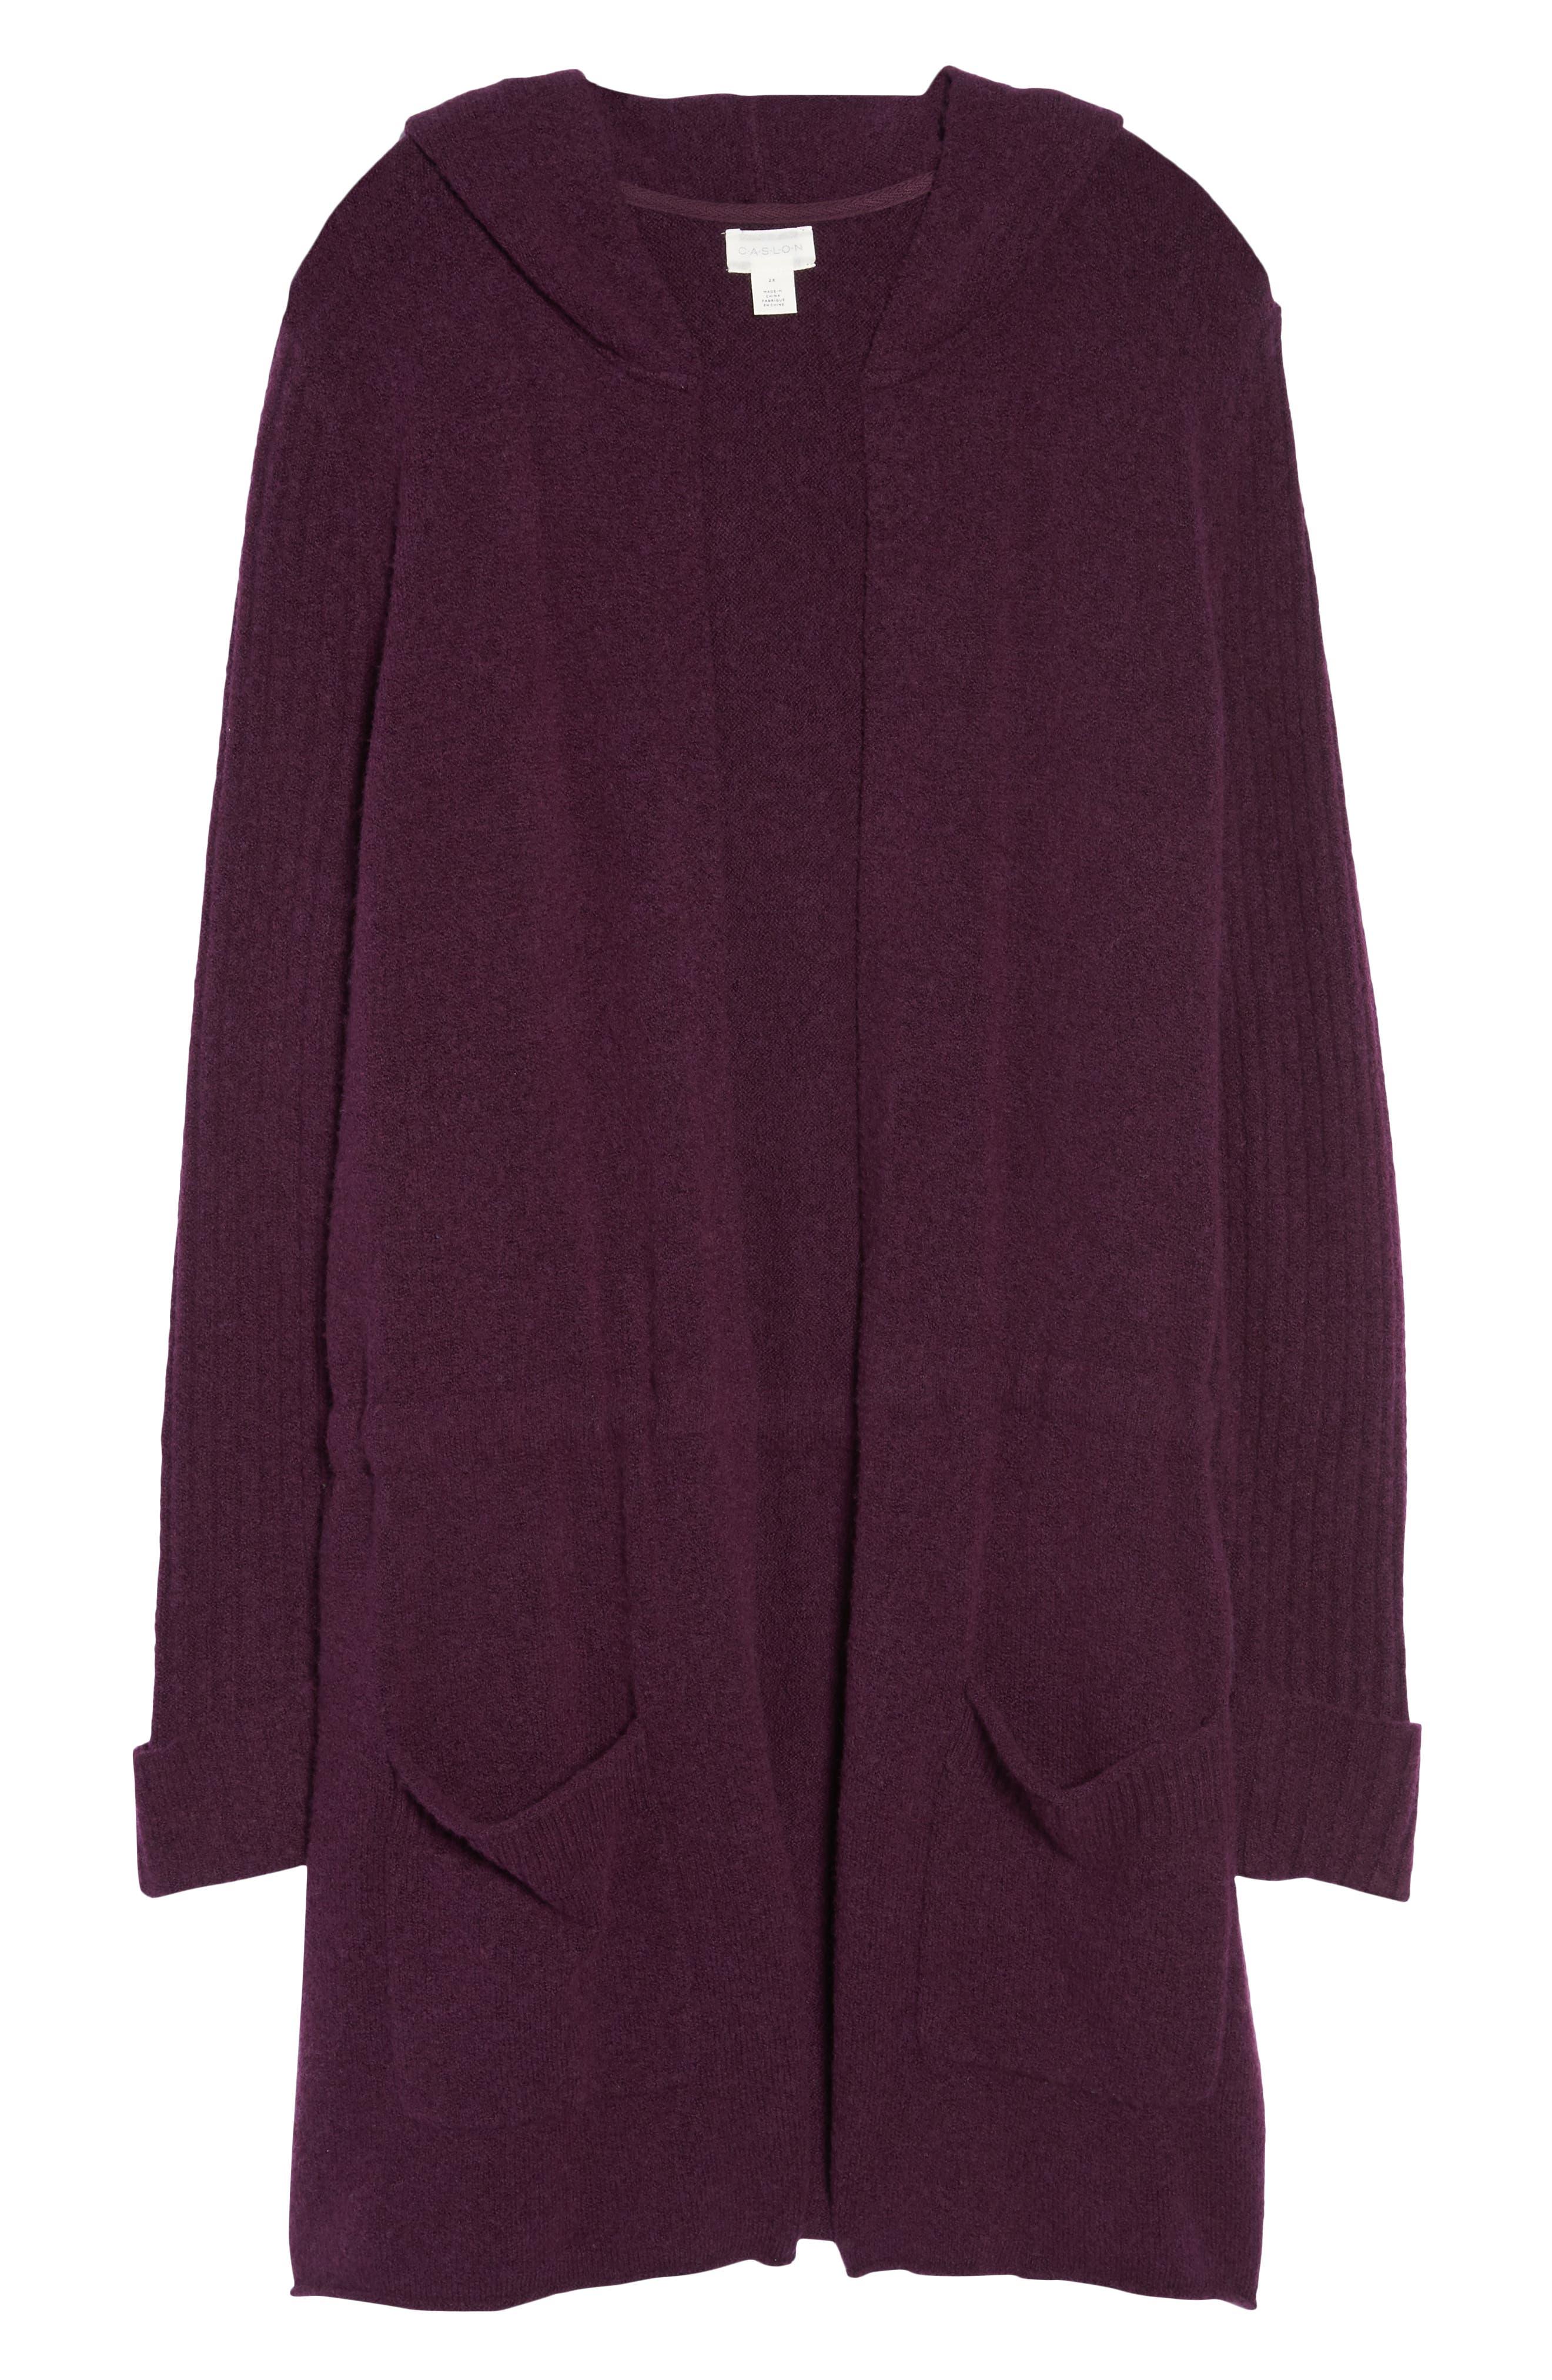 Hooded Cardigan,                             Alternate thumbnail 7, color,                             Purple Potent